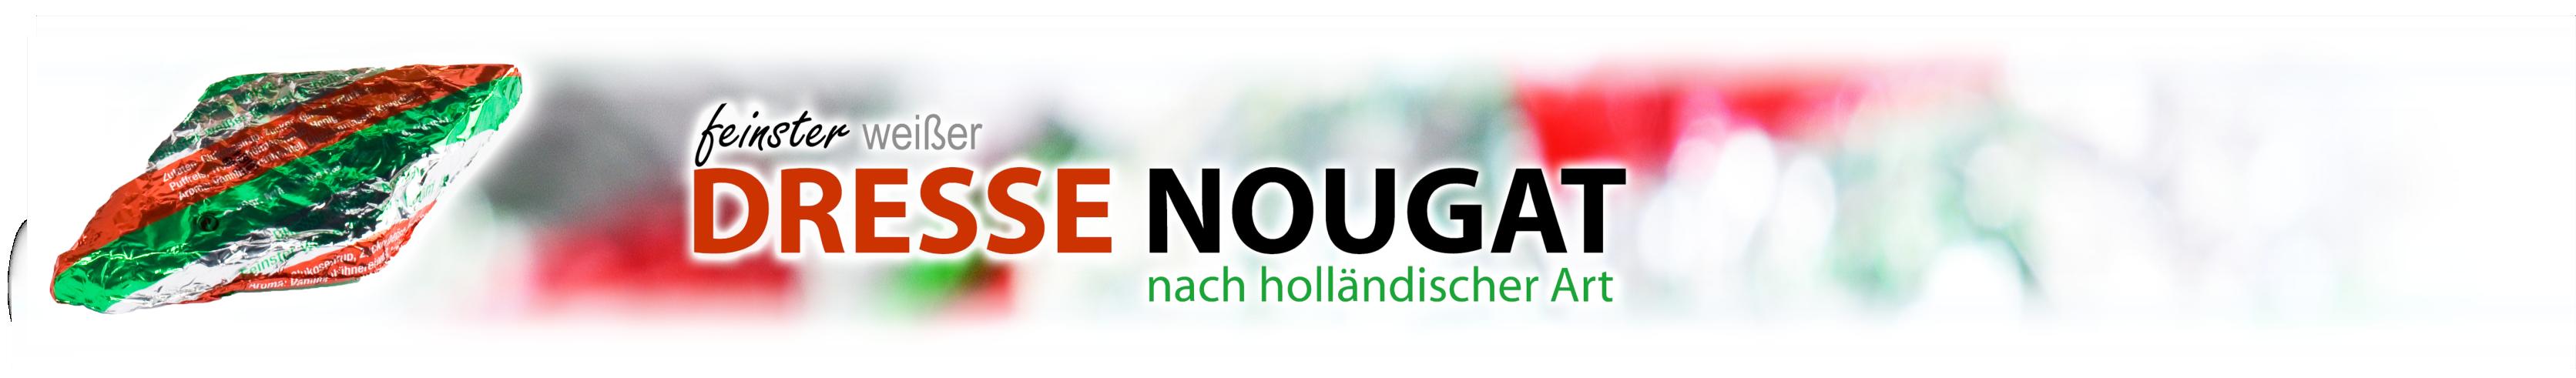 Dresse Nougat Logo